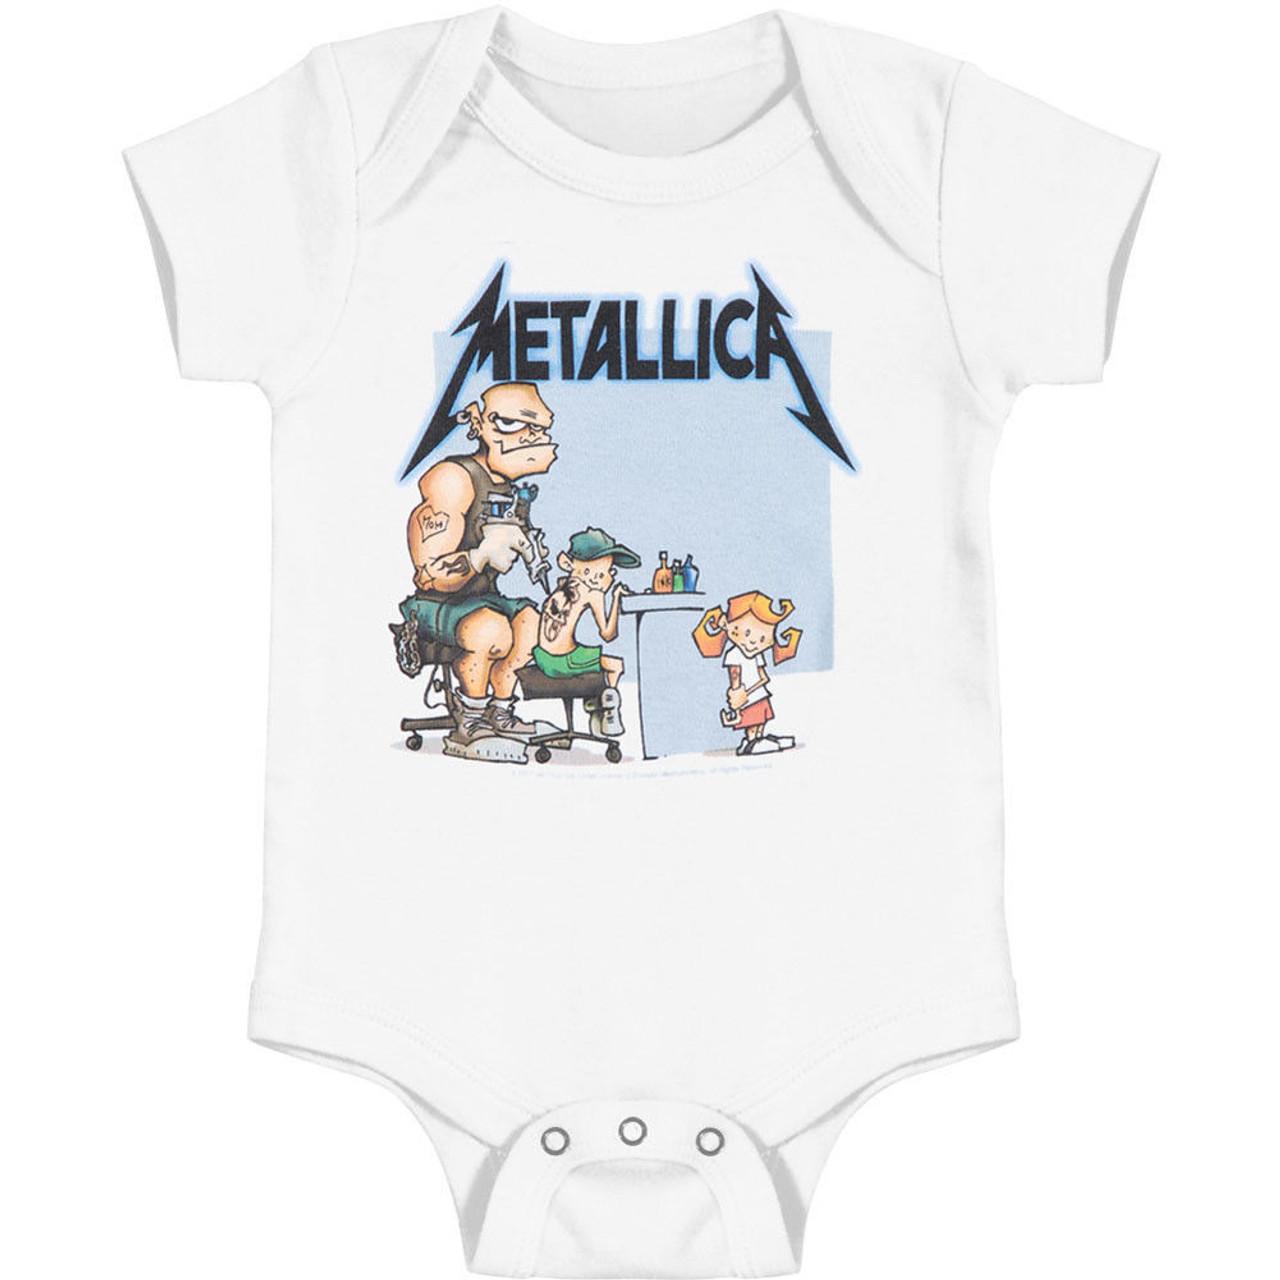 2fd219a7f Metallica Inked Tattooed Metal Bodysuit One Piece Baby Infant Romper  50040438 - Fearless Apparel